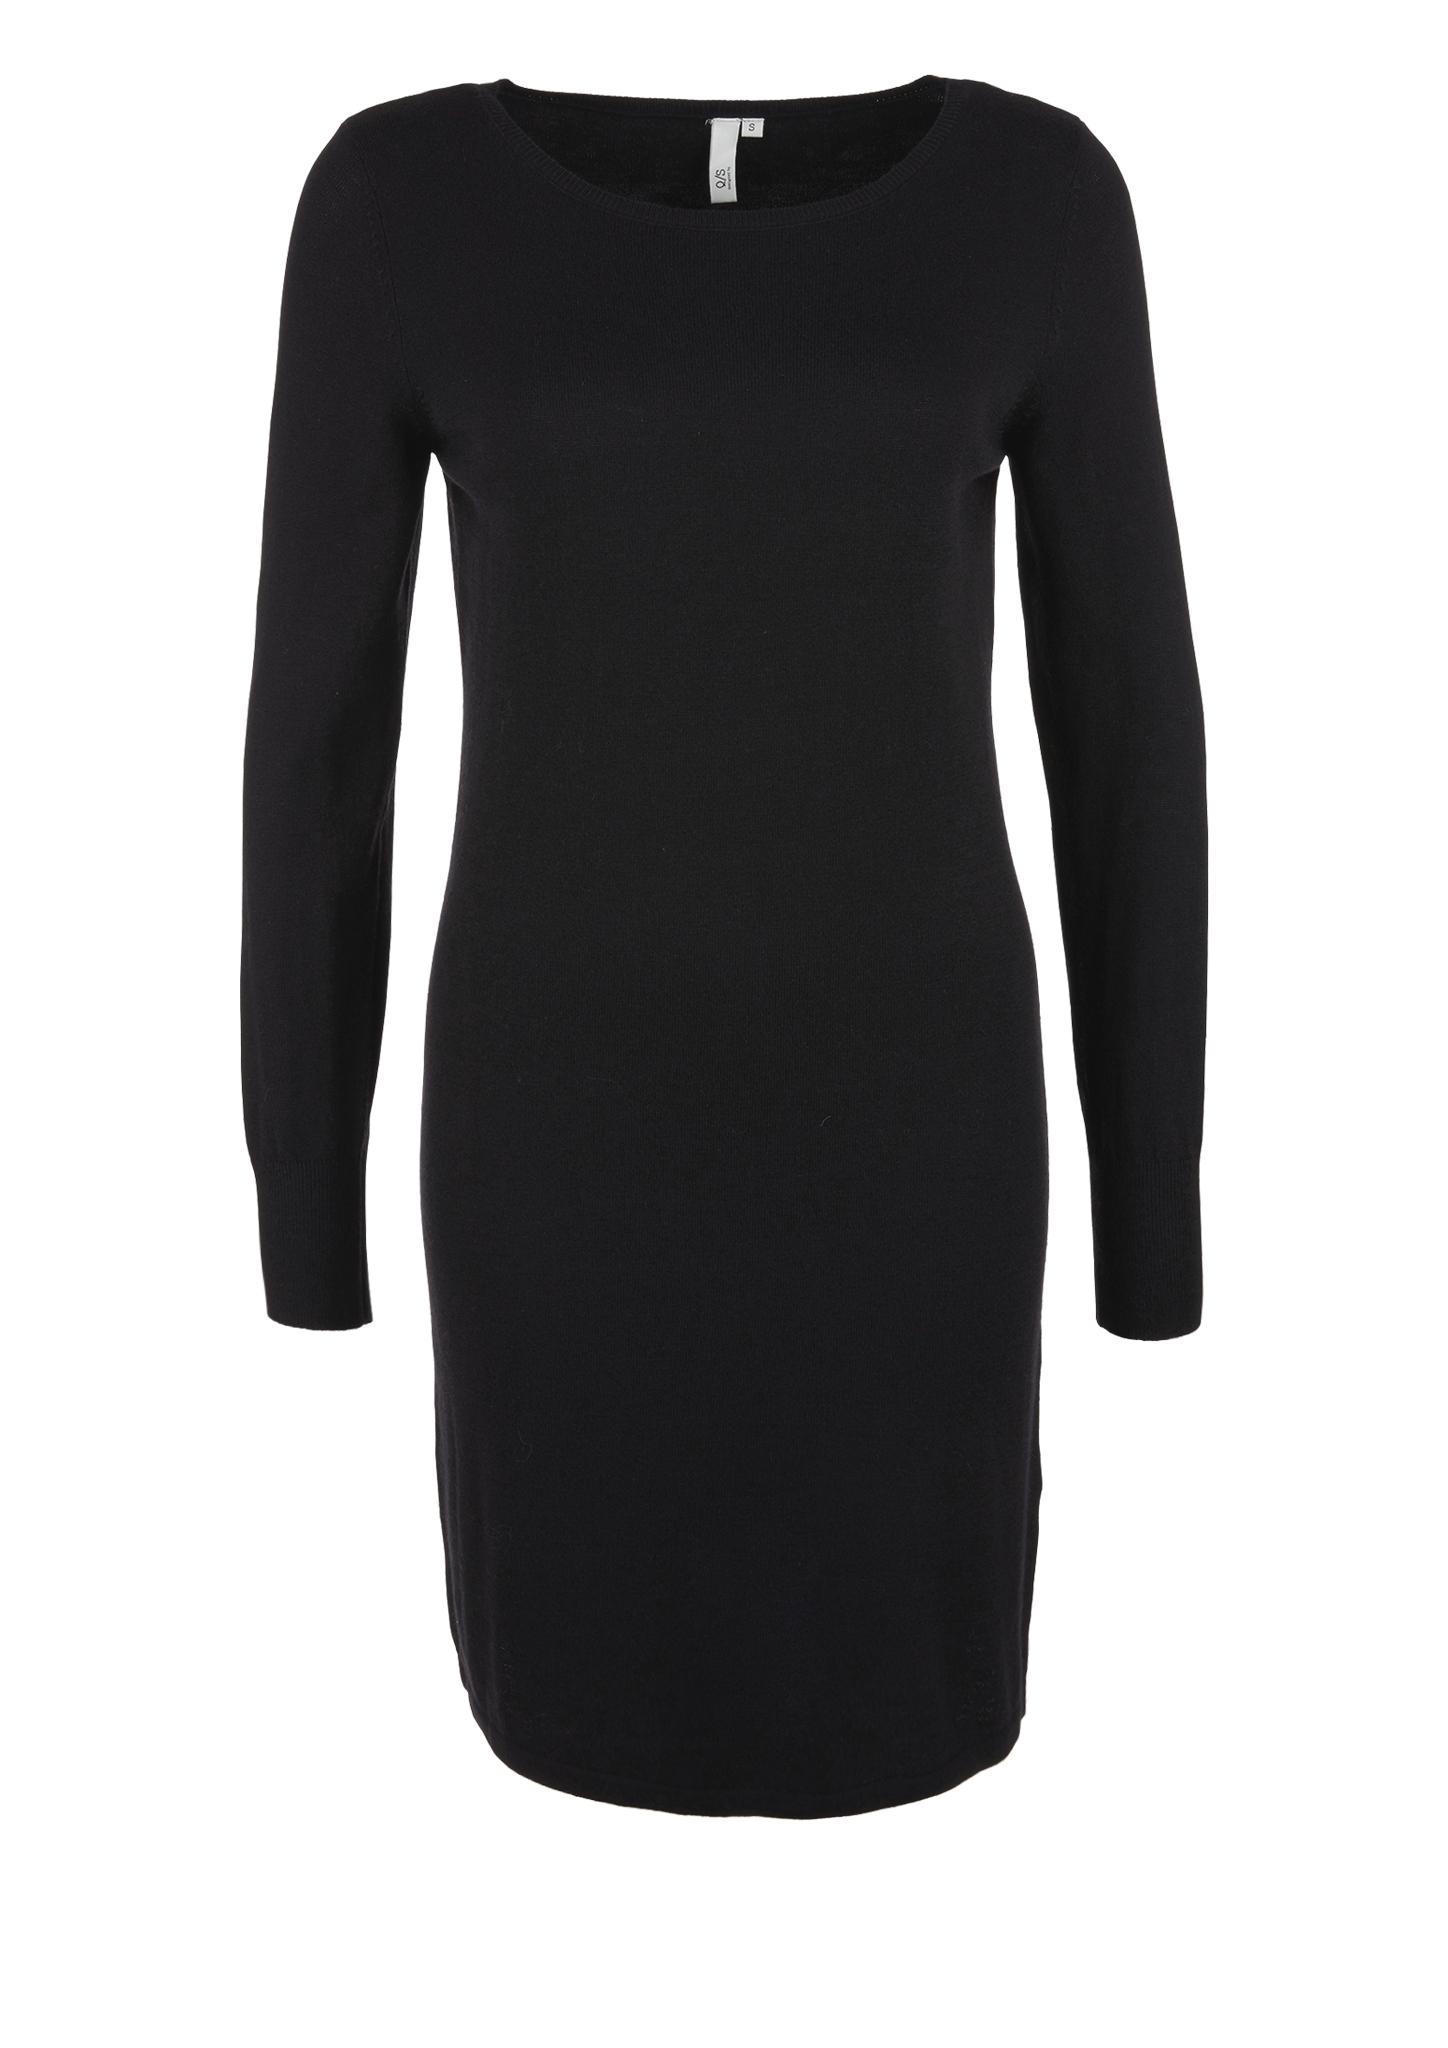 Strickkleid | Bekleidung > Kleider > Strickkleider | Q/S designed by